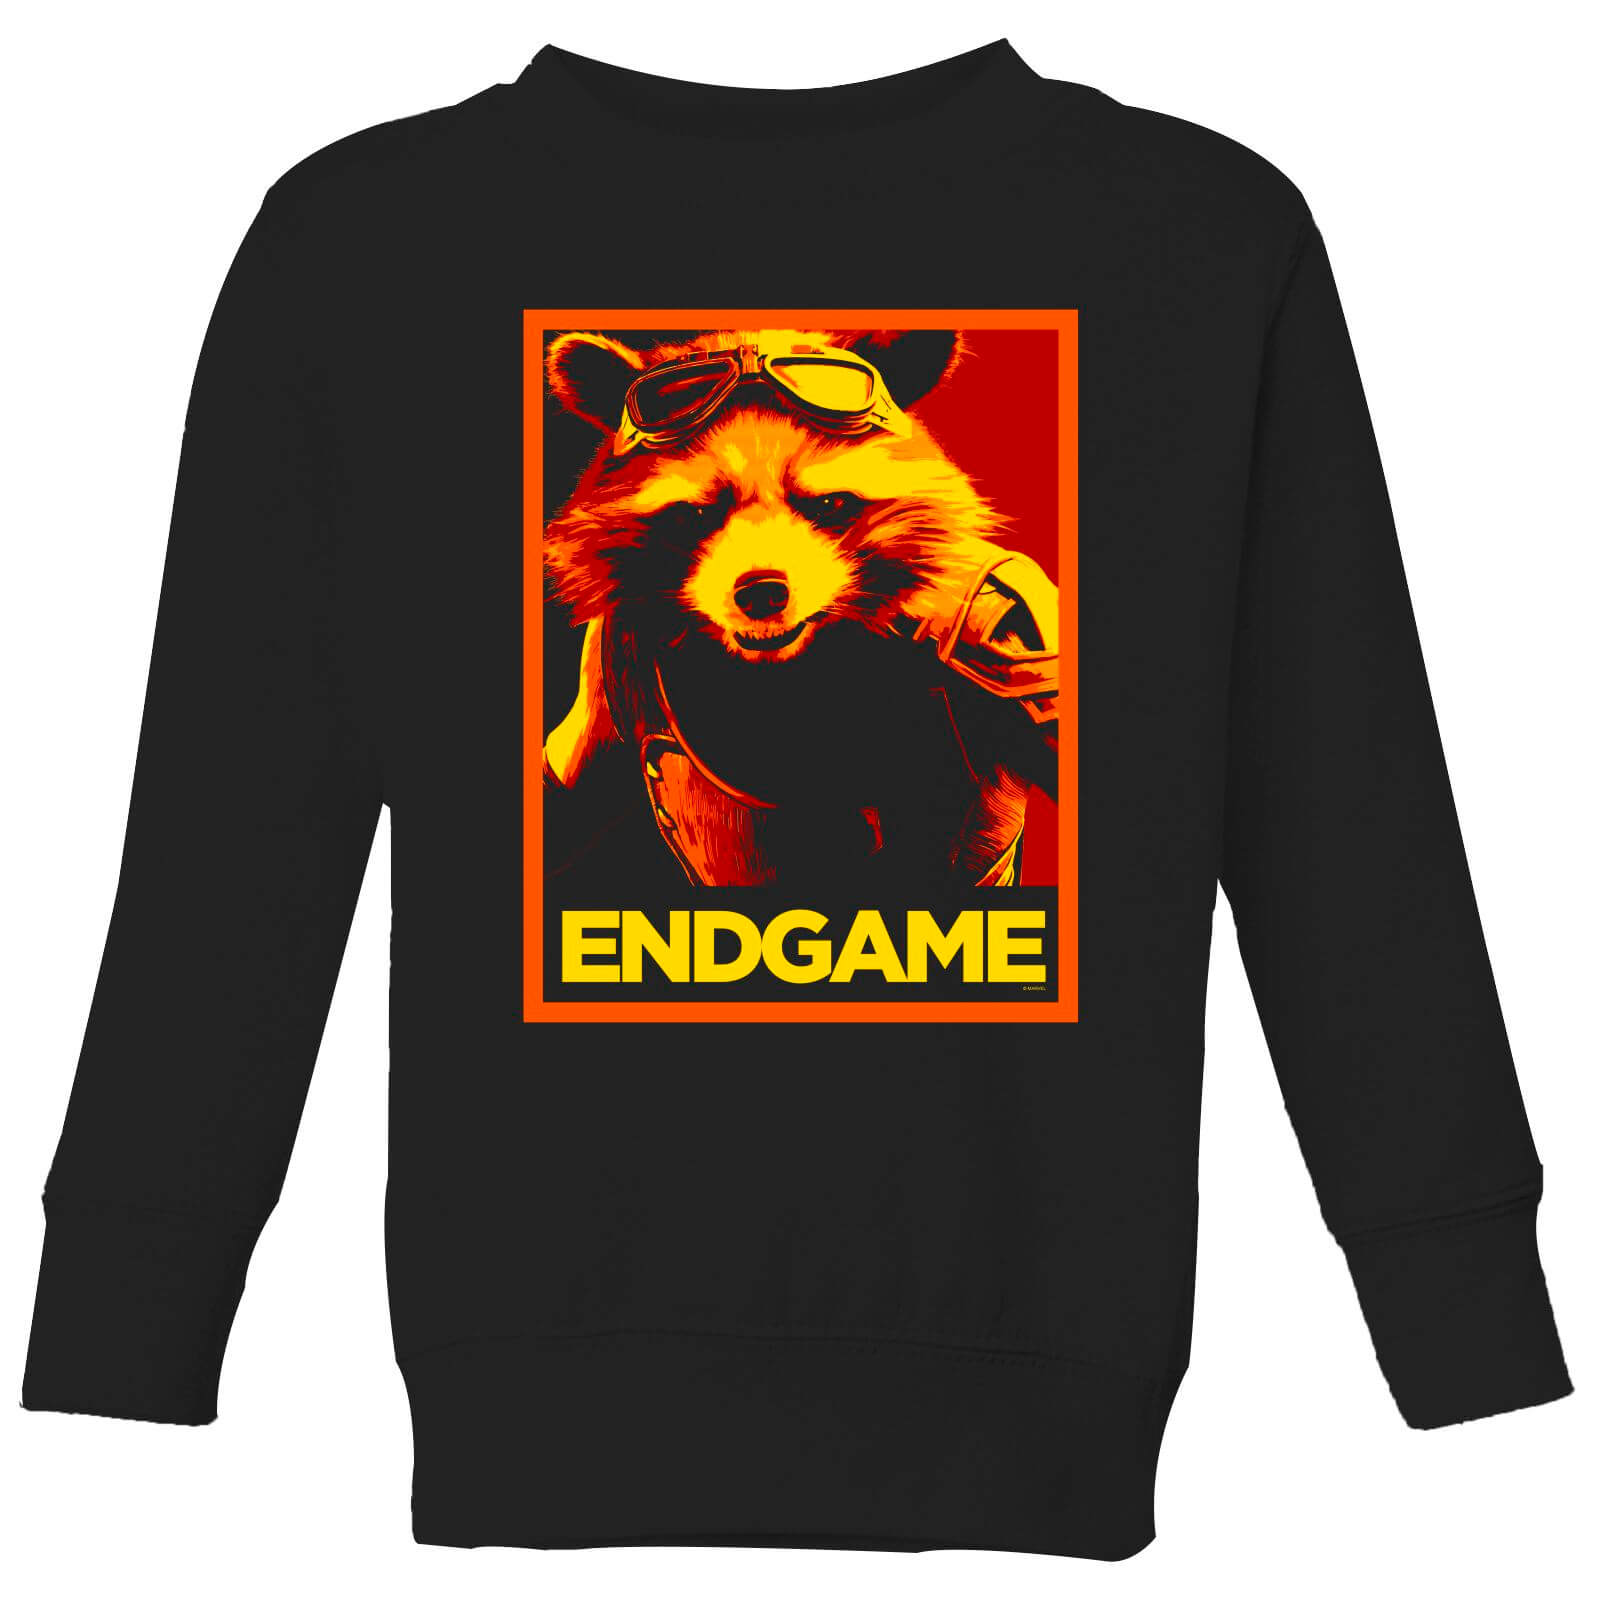 Avengers Endgame Rocket Poster Kids Sweatshirt Black Pop In A